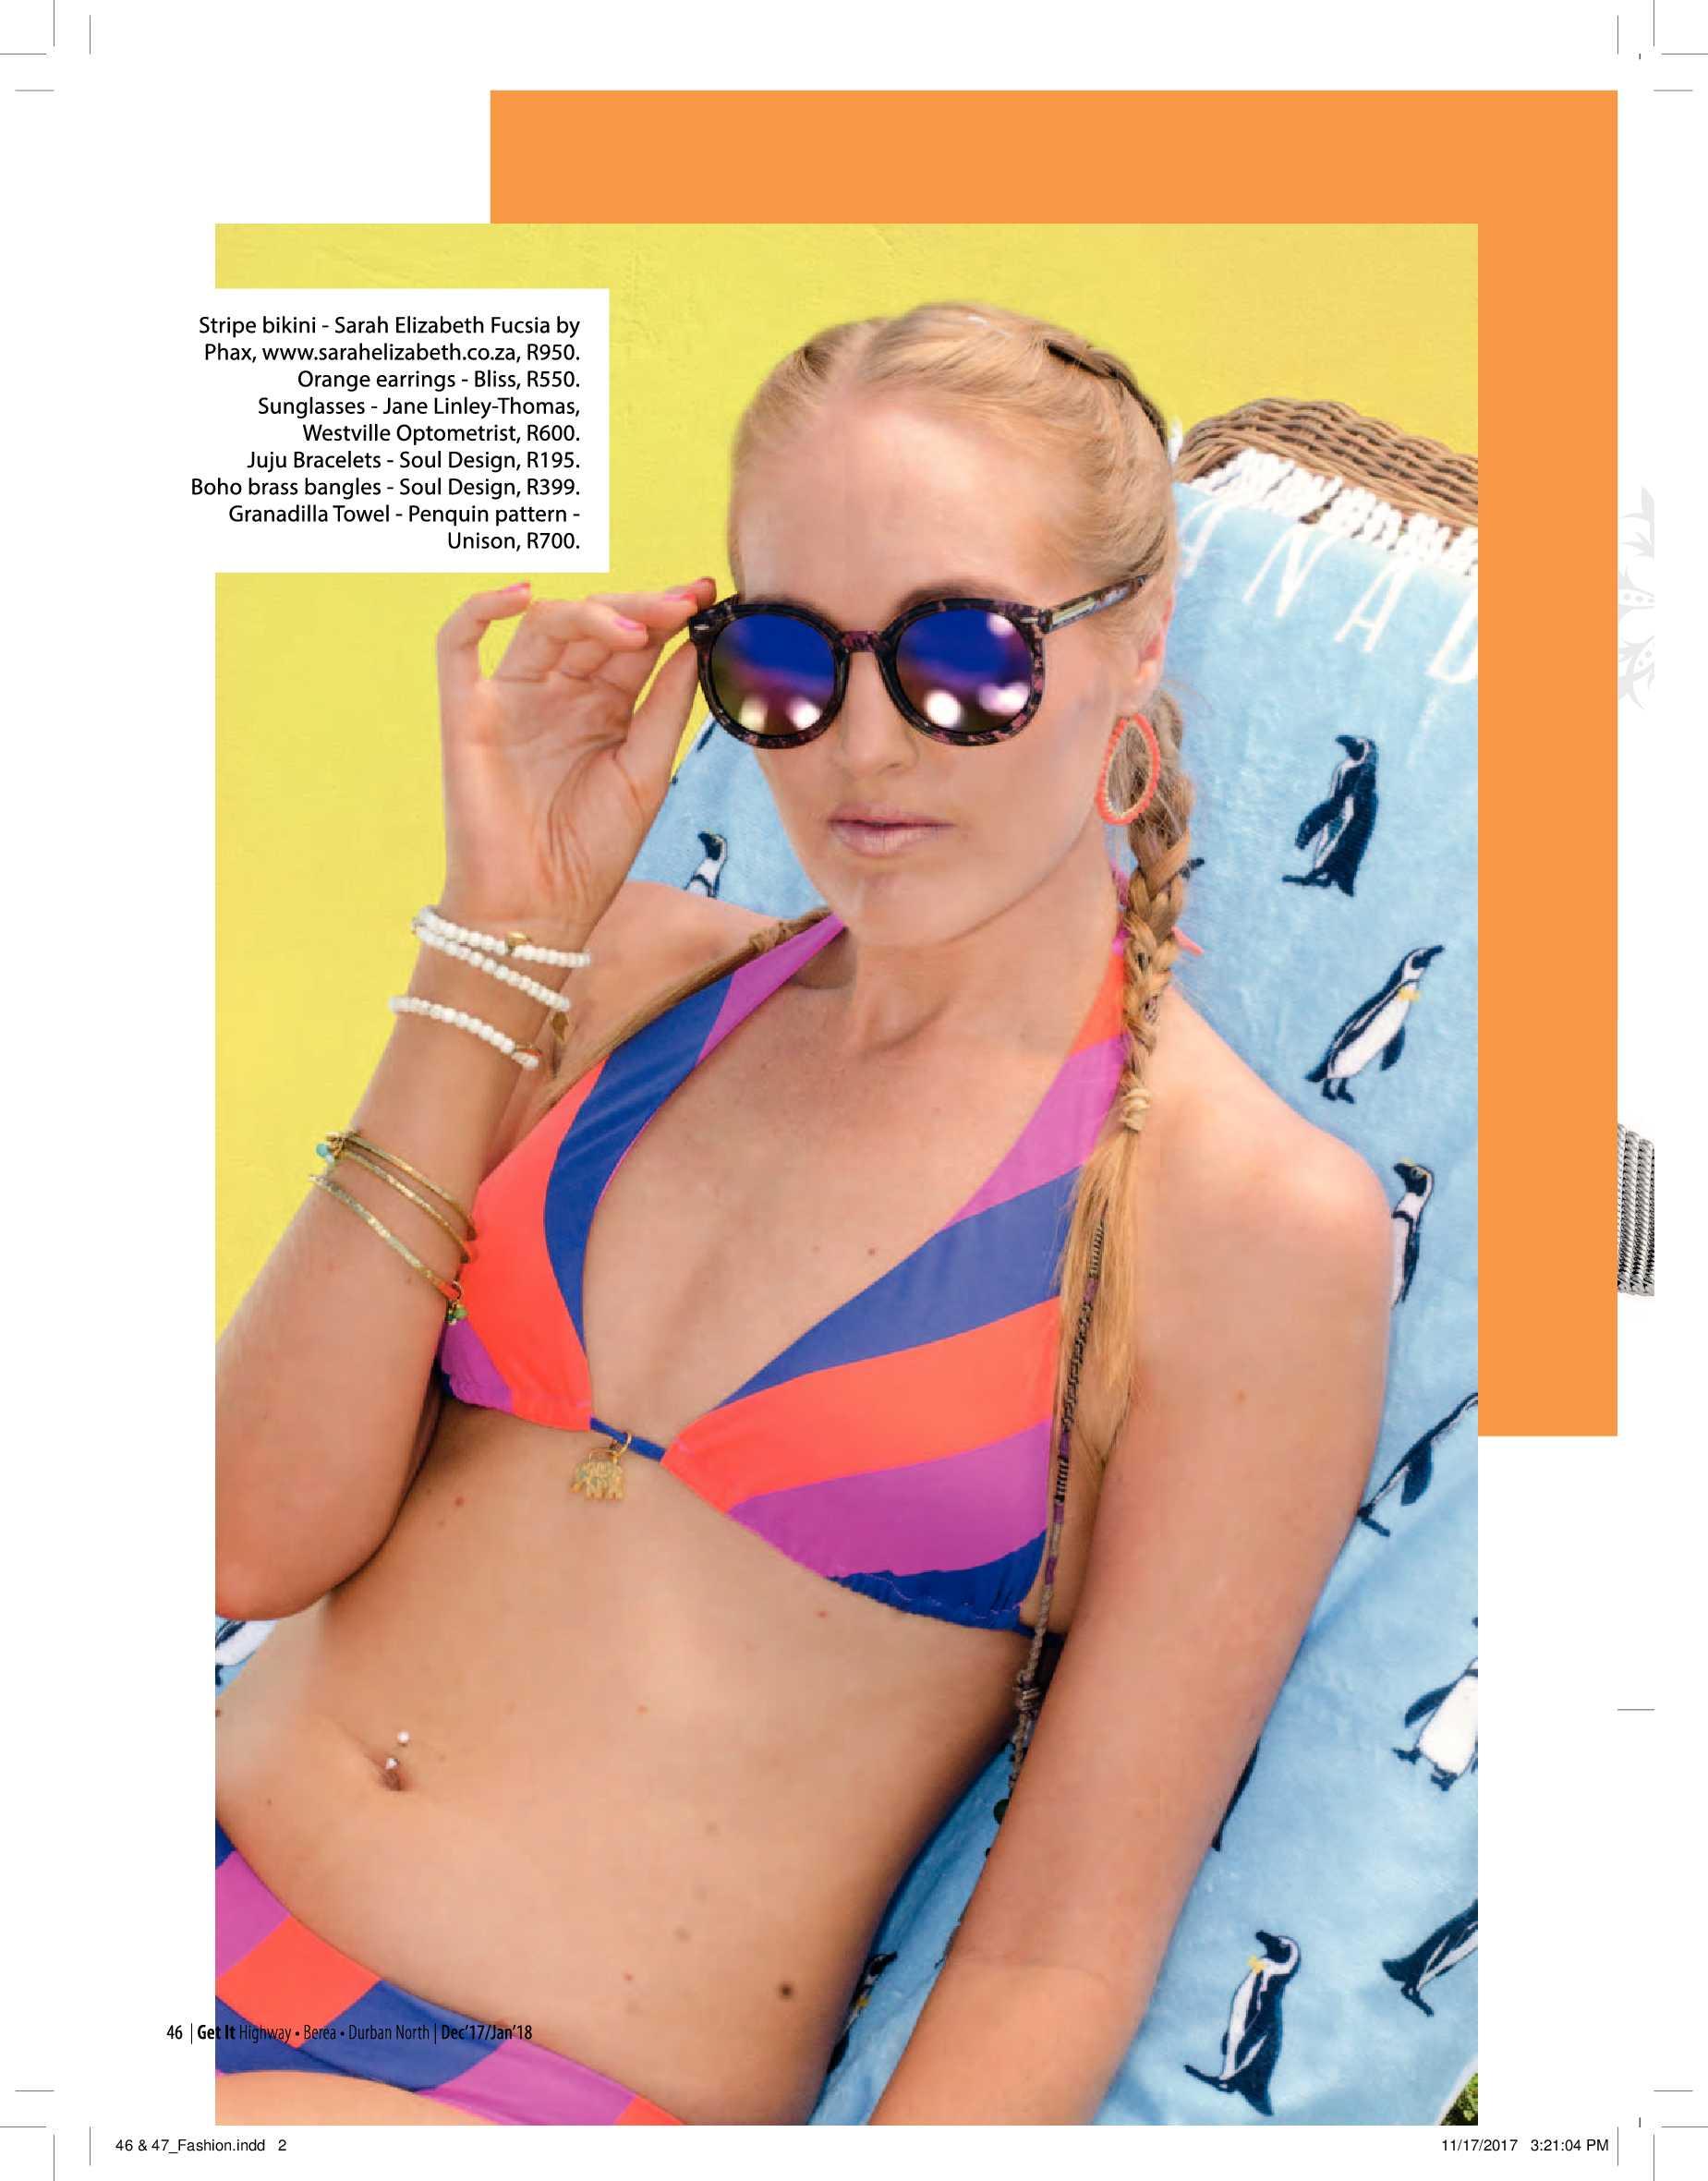 get-magazine-durban-december-2017-epapers-page-48